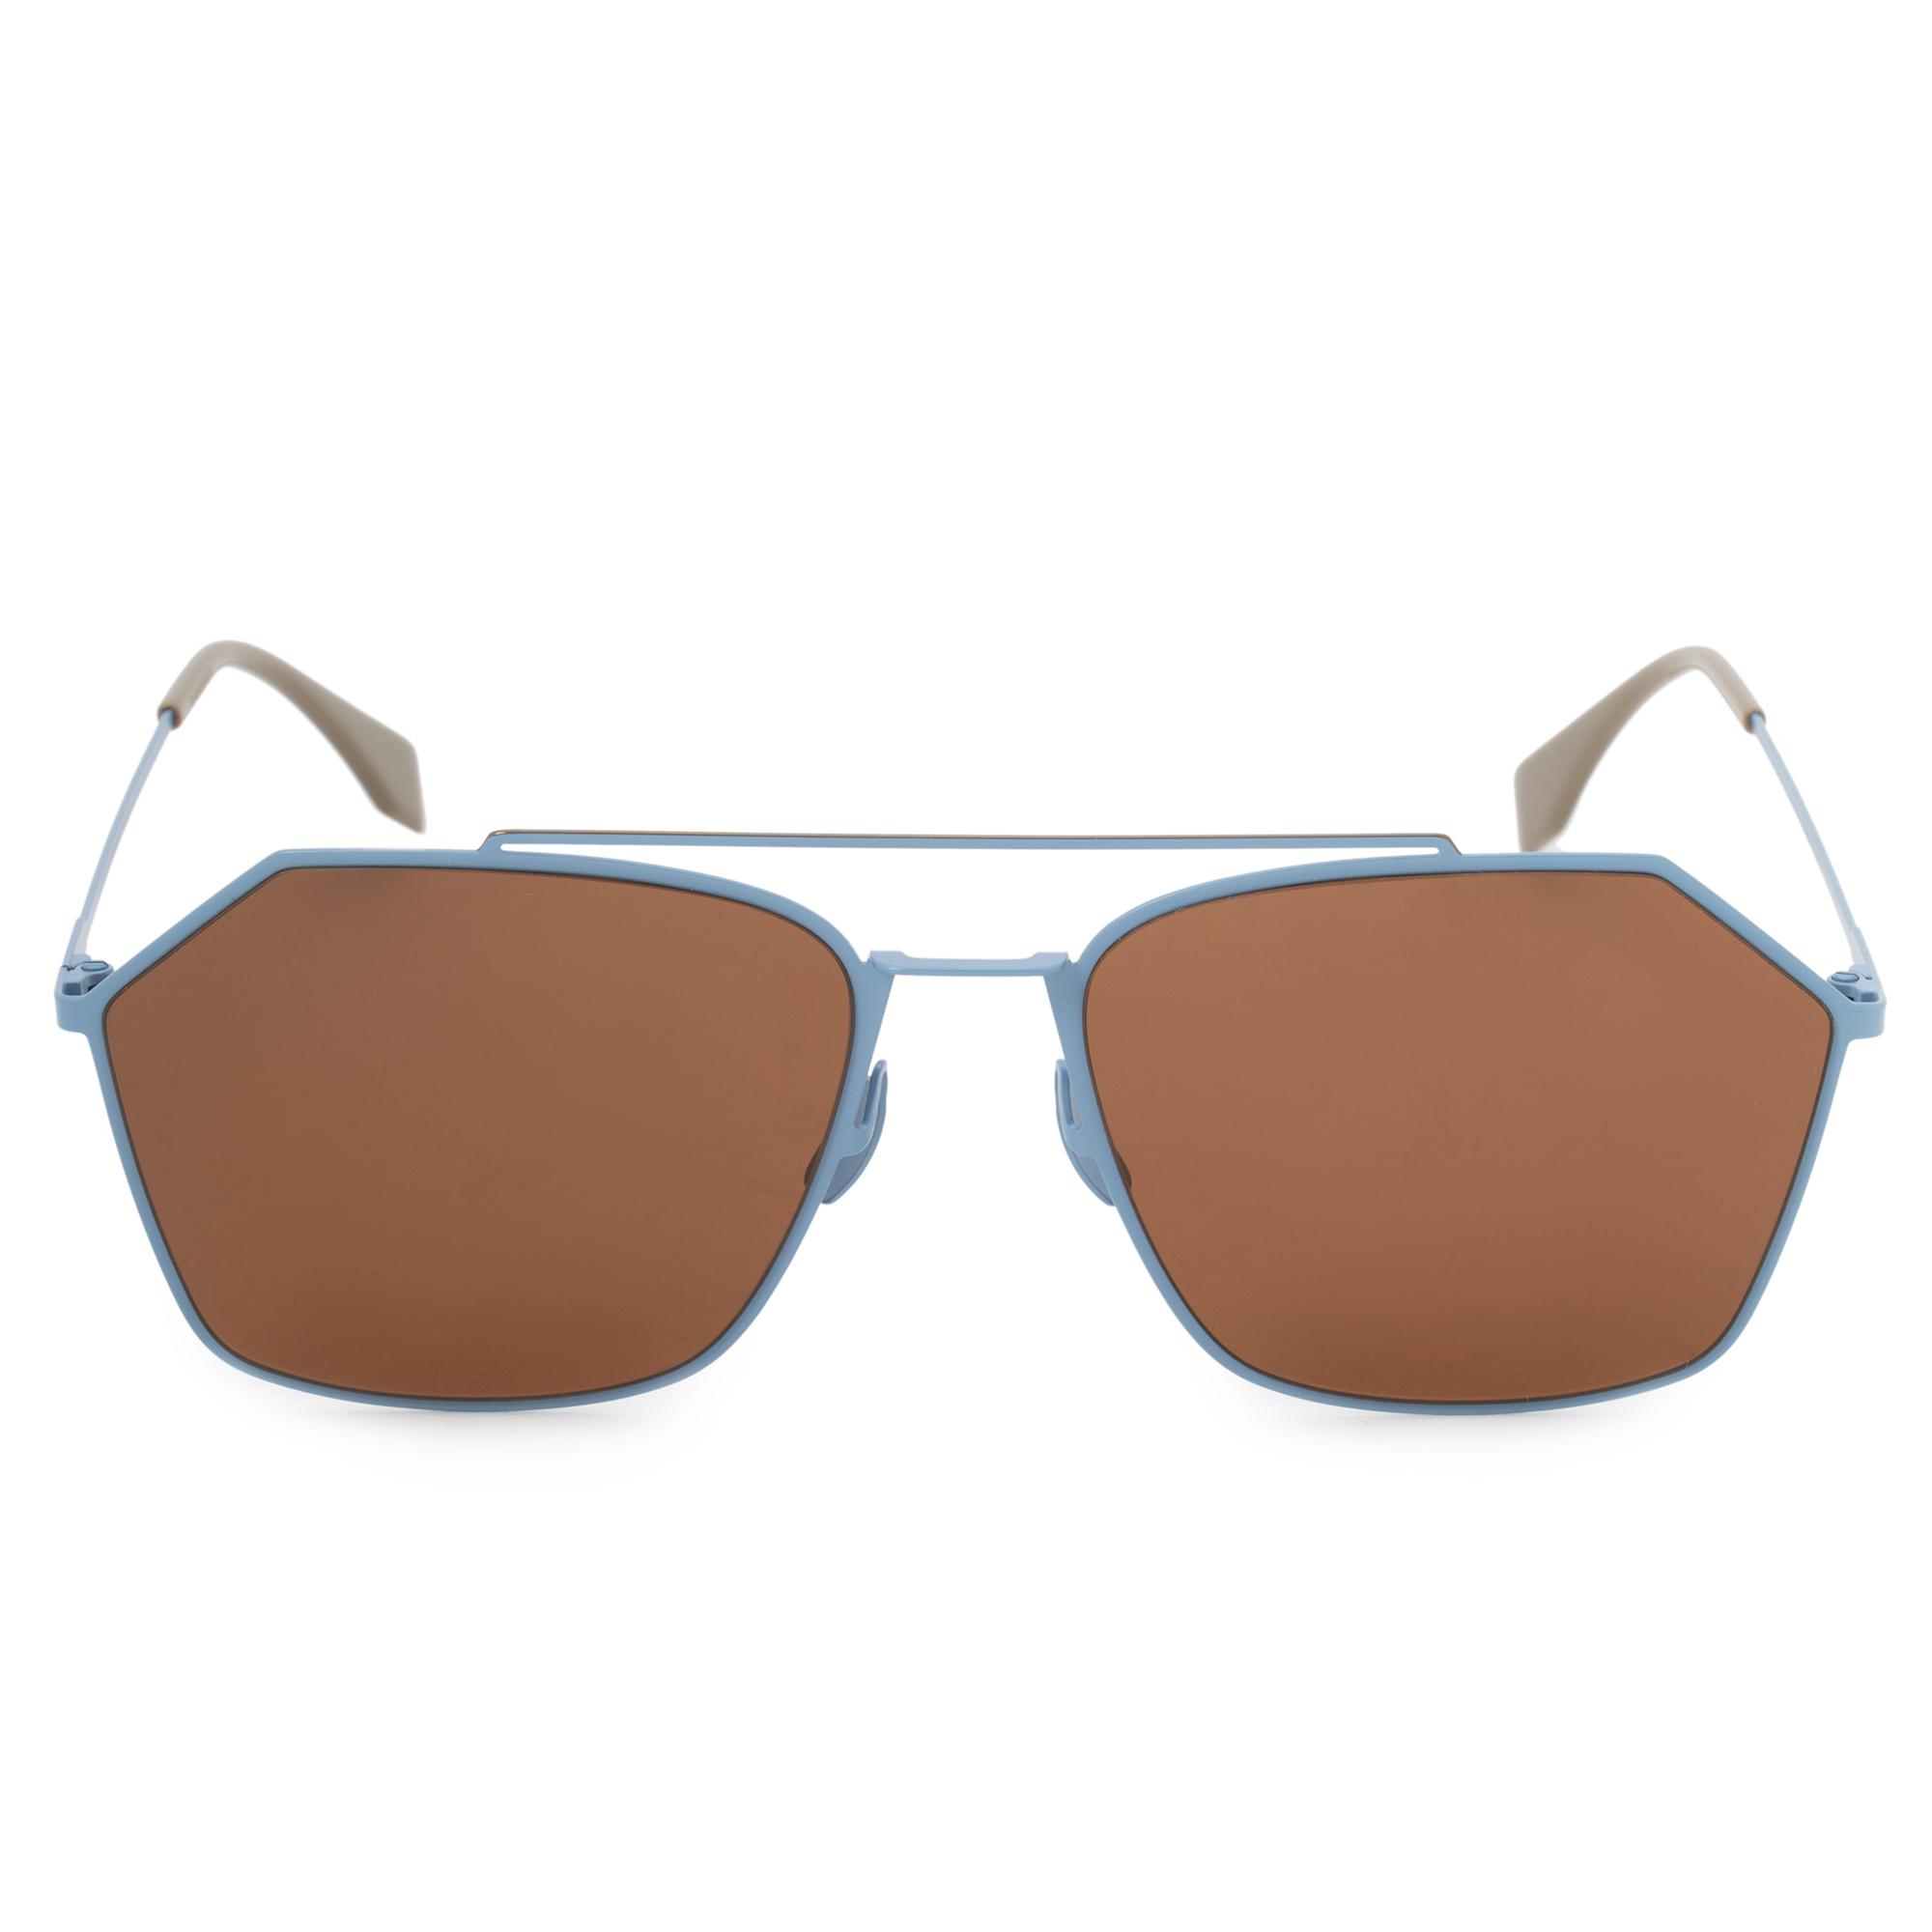 bc9c0ea5eac3 Fendi Fendi Eyeline Aviator Sunglasses FFM0022S F MVU 70 59 ...